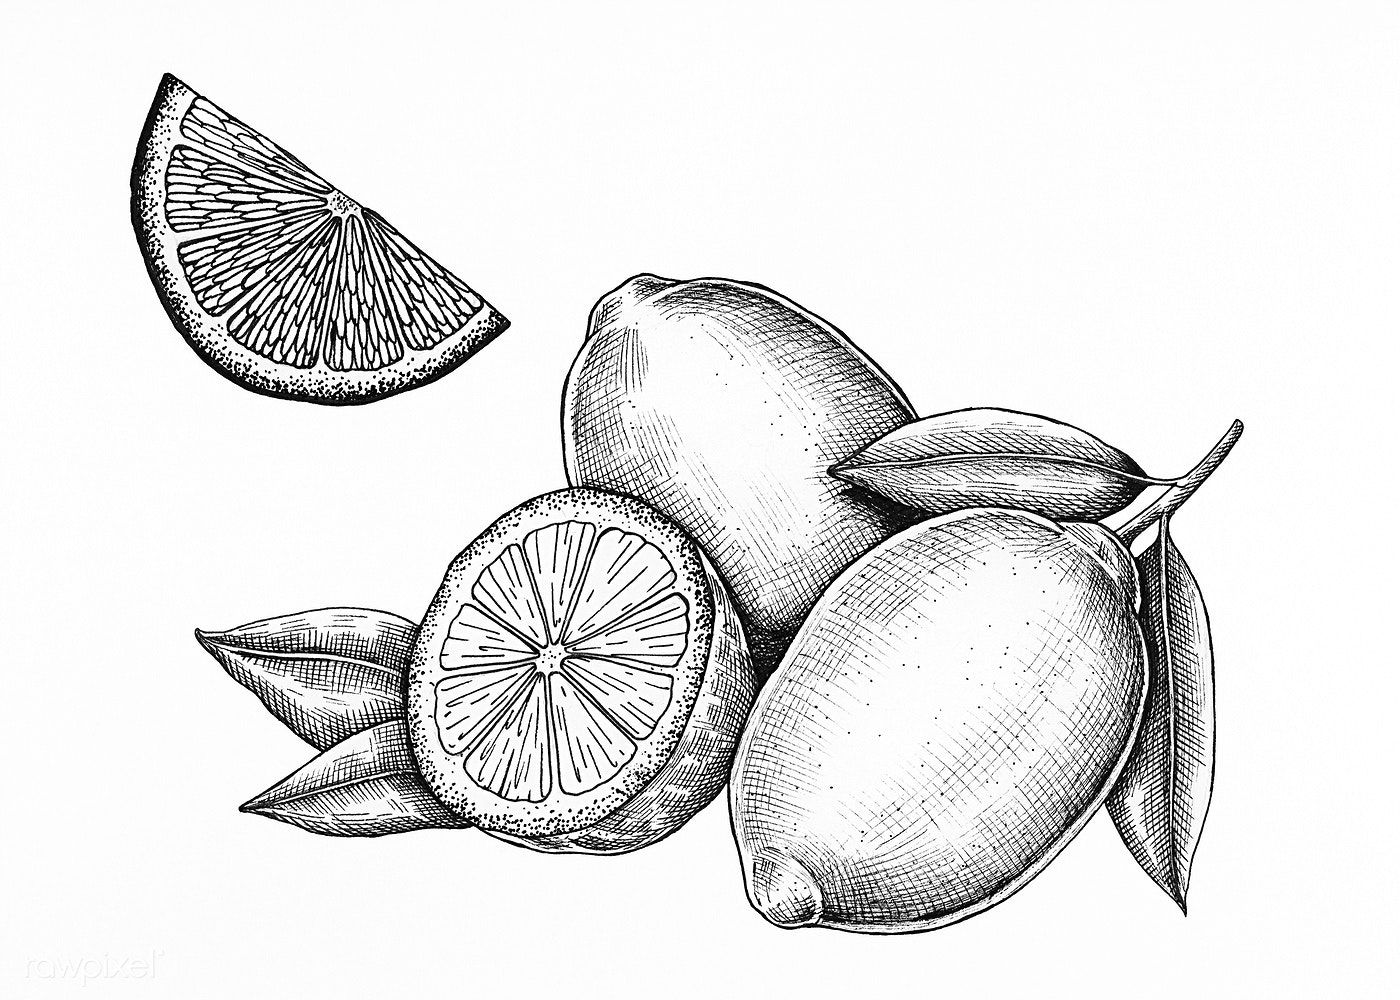 Download premium illustration of Hand drawn fresh lemons